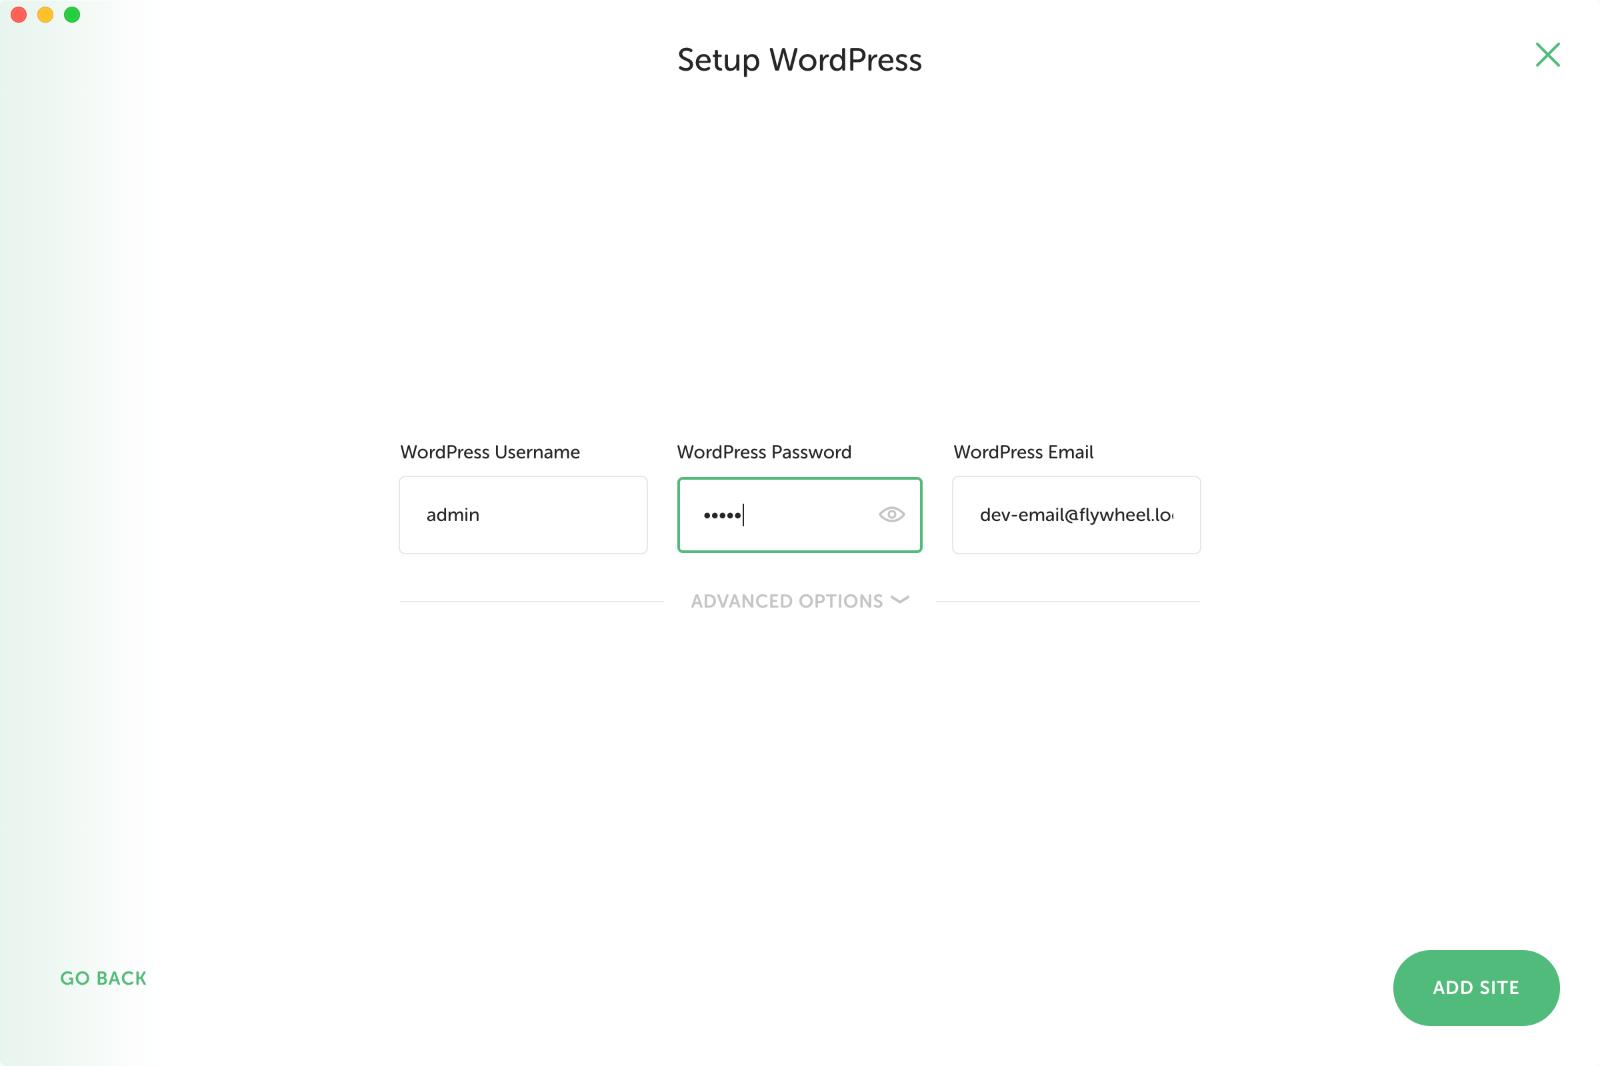 WordPressの管理者アカウント情報を入力する